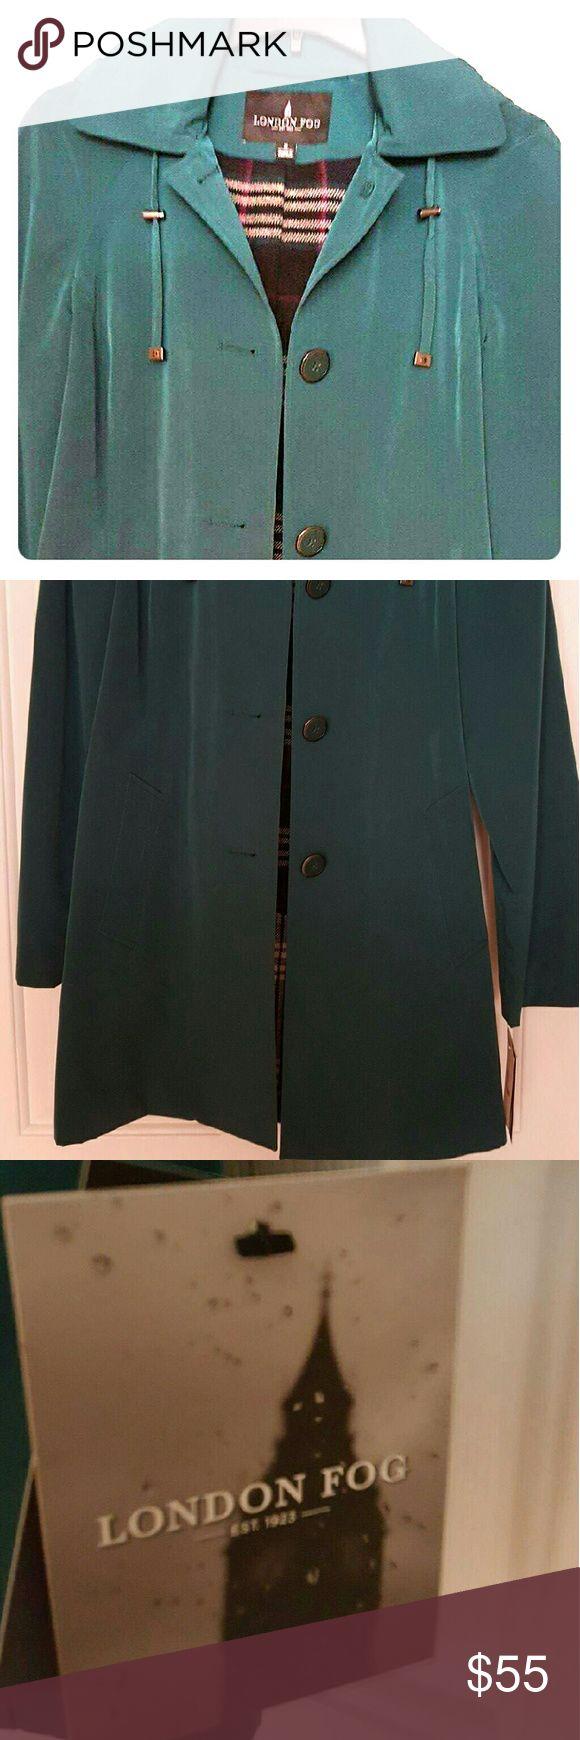 SALE! *Green London Fog Raincoat* Brand new dark green raincoat with a hood. Has plaid interior. London Fog Jackets & Coats Utility Jackets